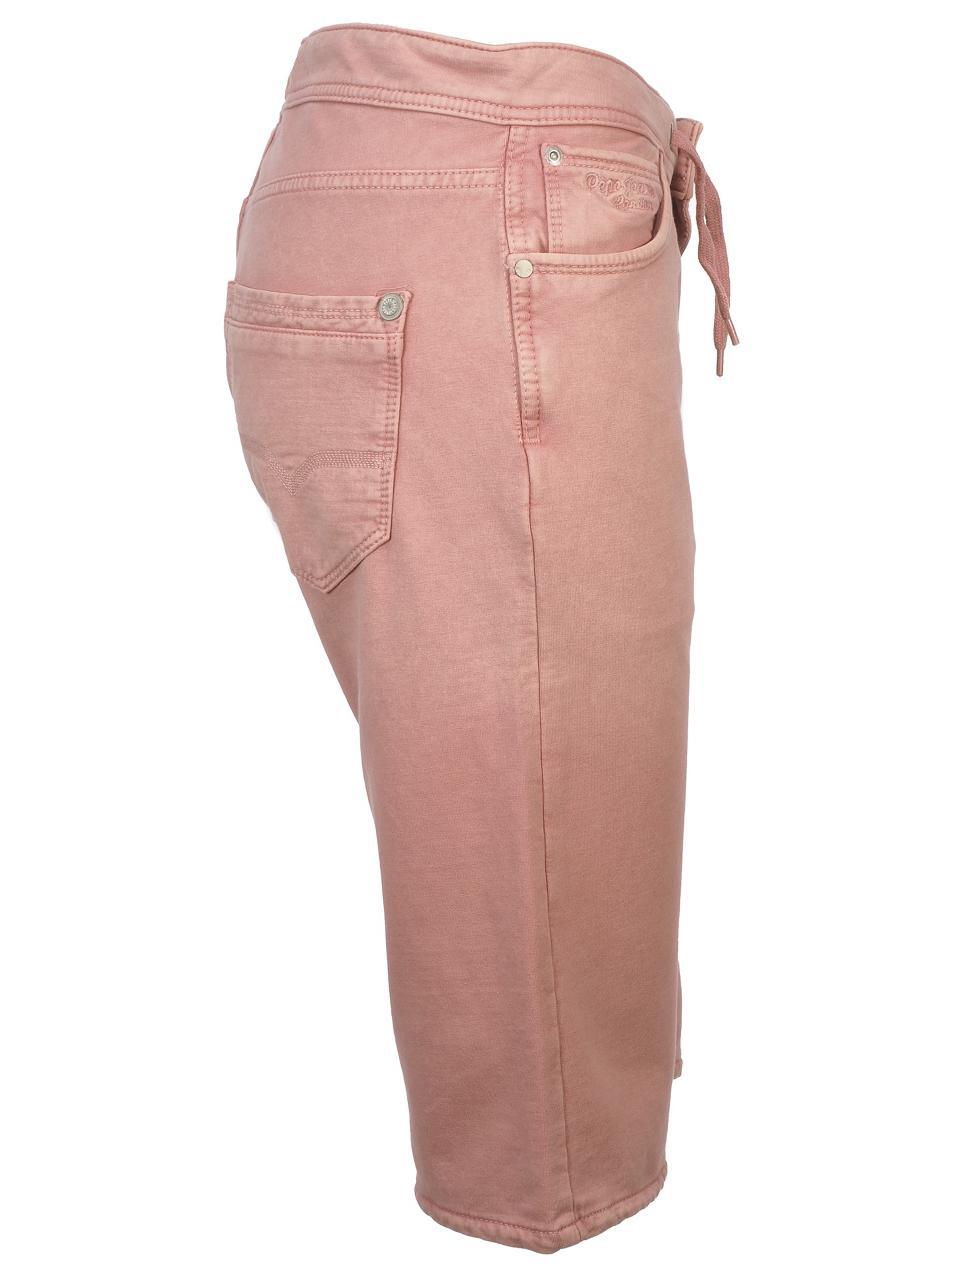 Bermuda-Shorts-Pepe-Jeans-Gene-Pink-Shorts-Jr-Pink-51544-New